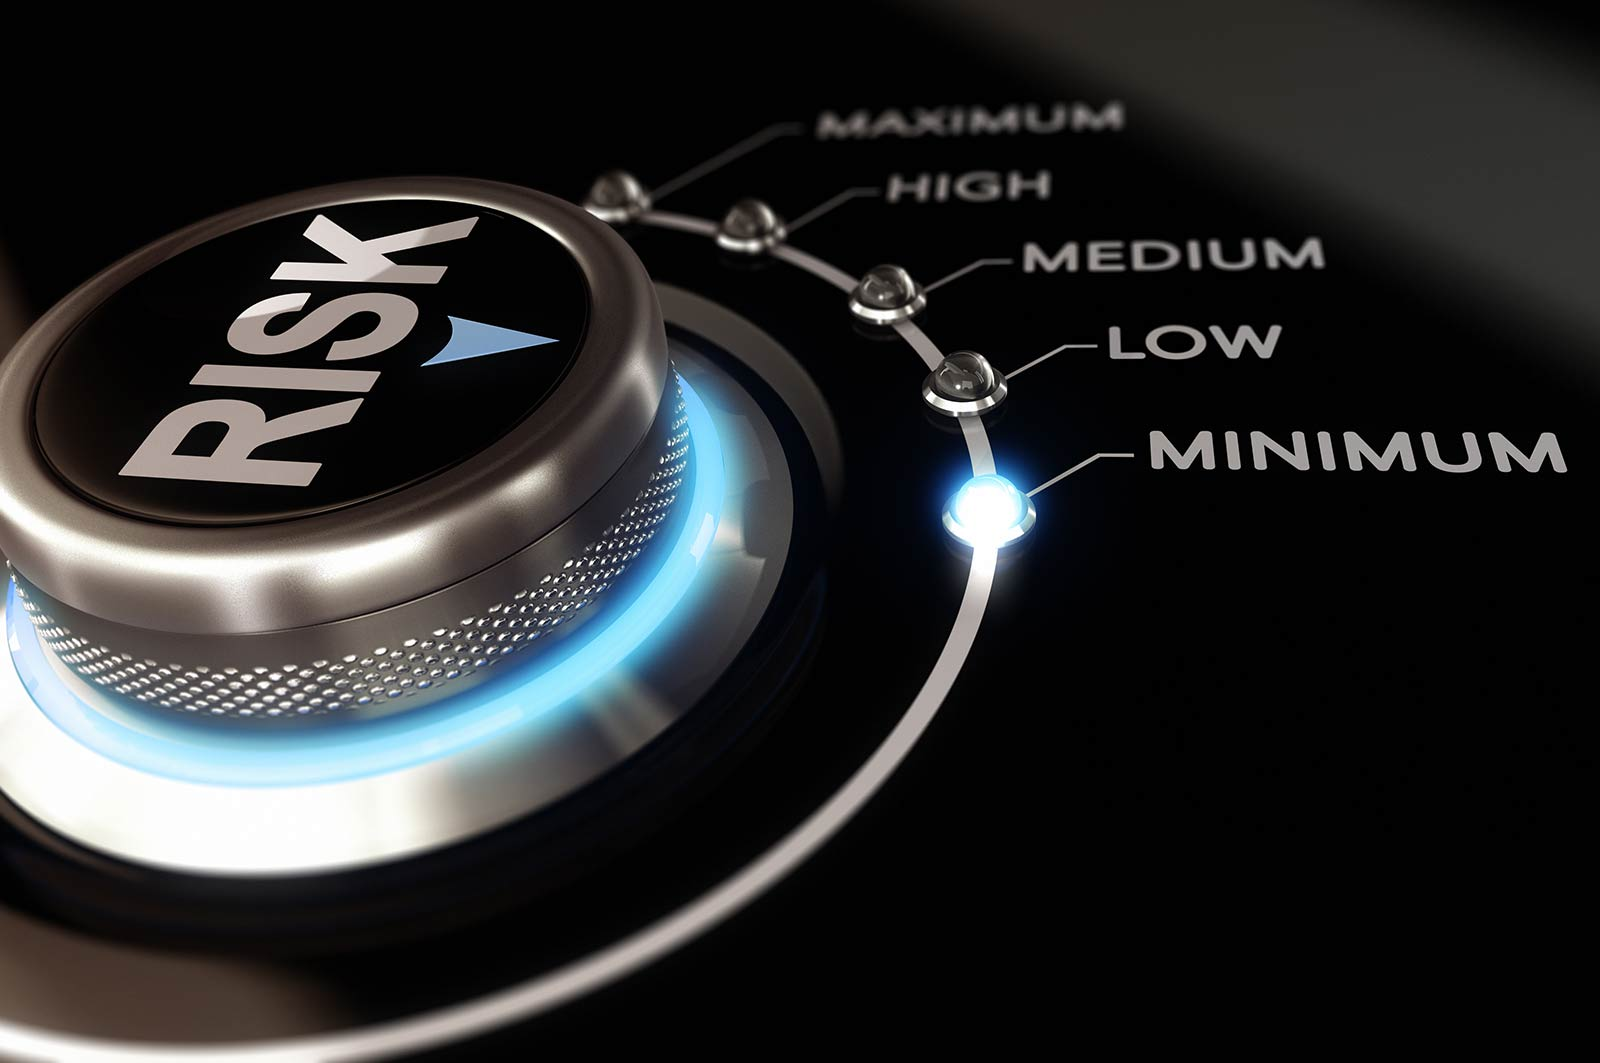 RI&E identificeert verschillende risico niveau's